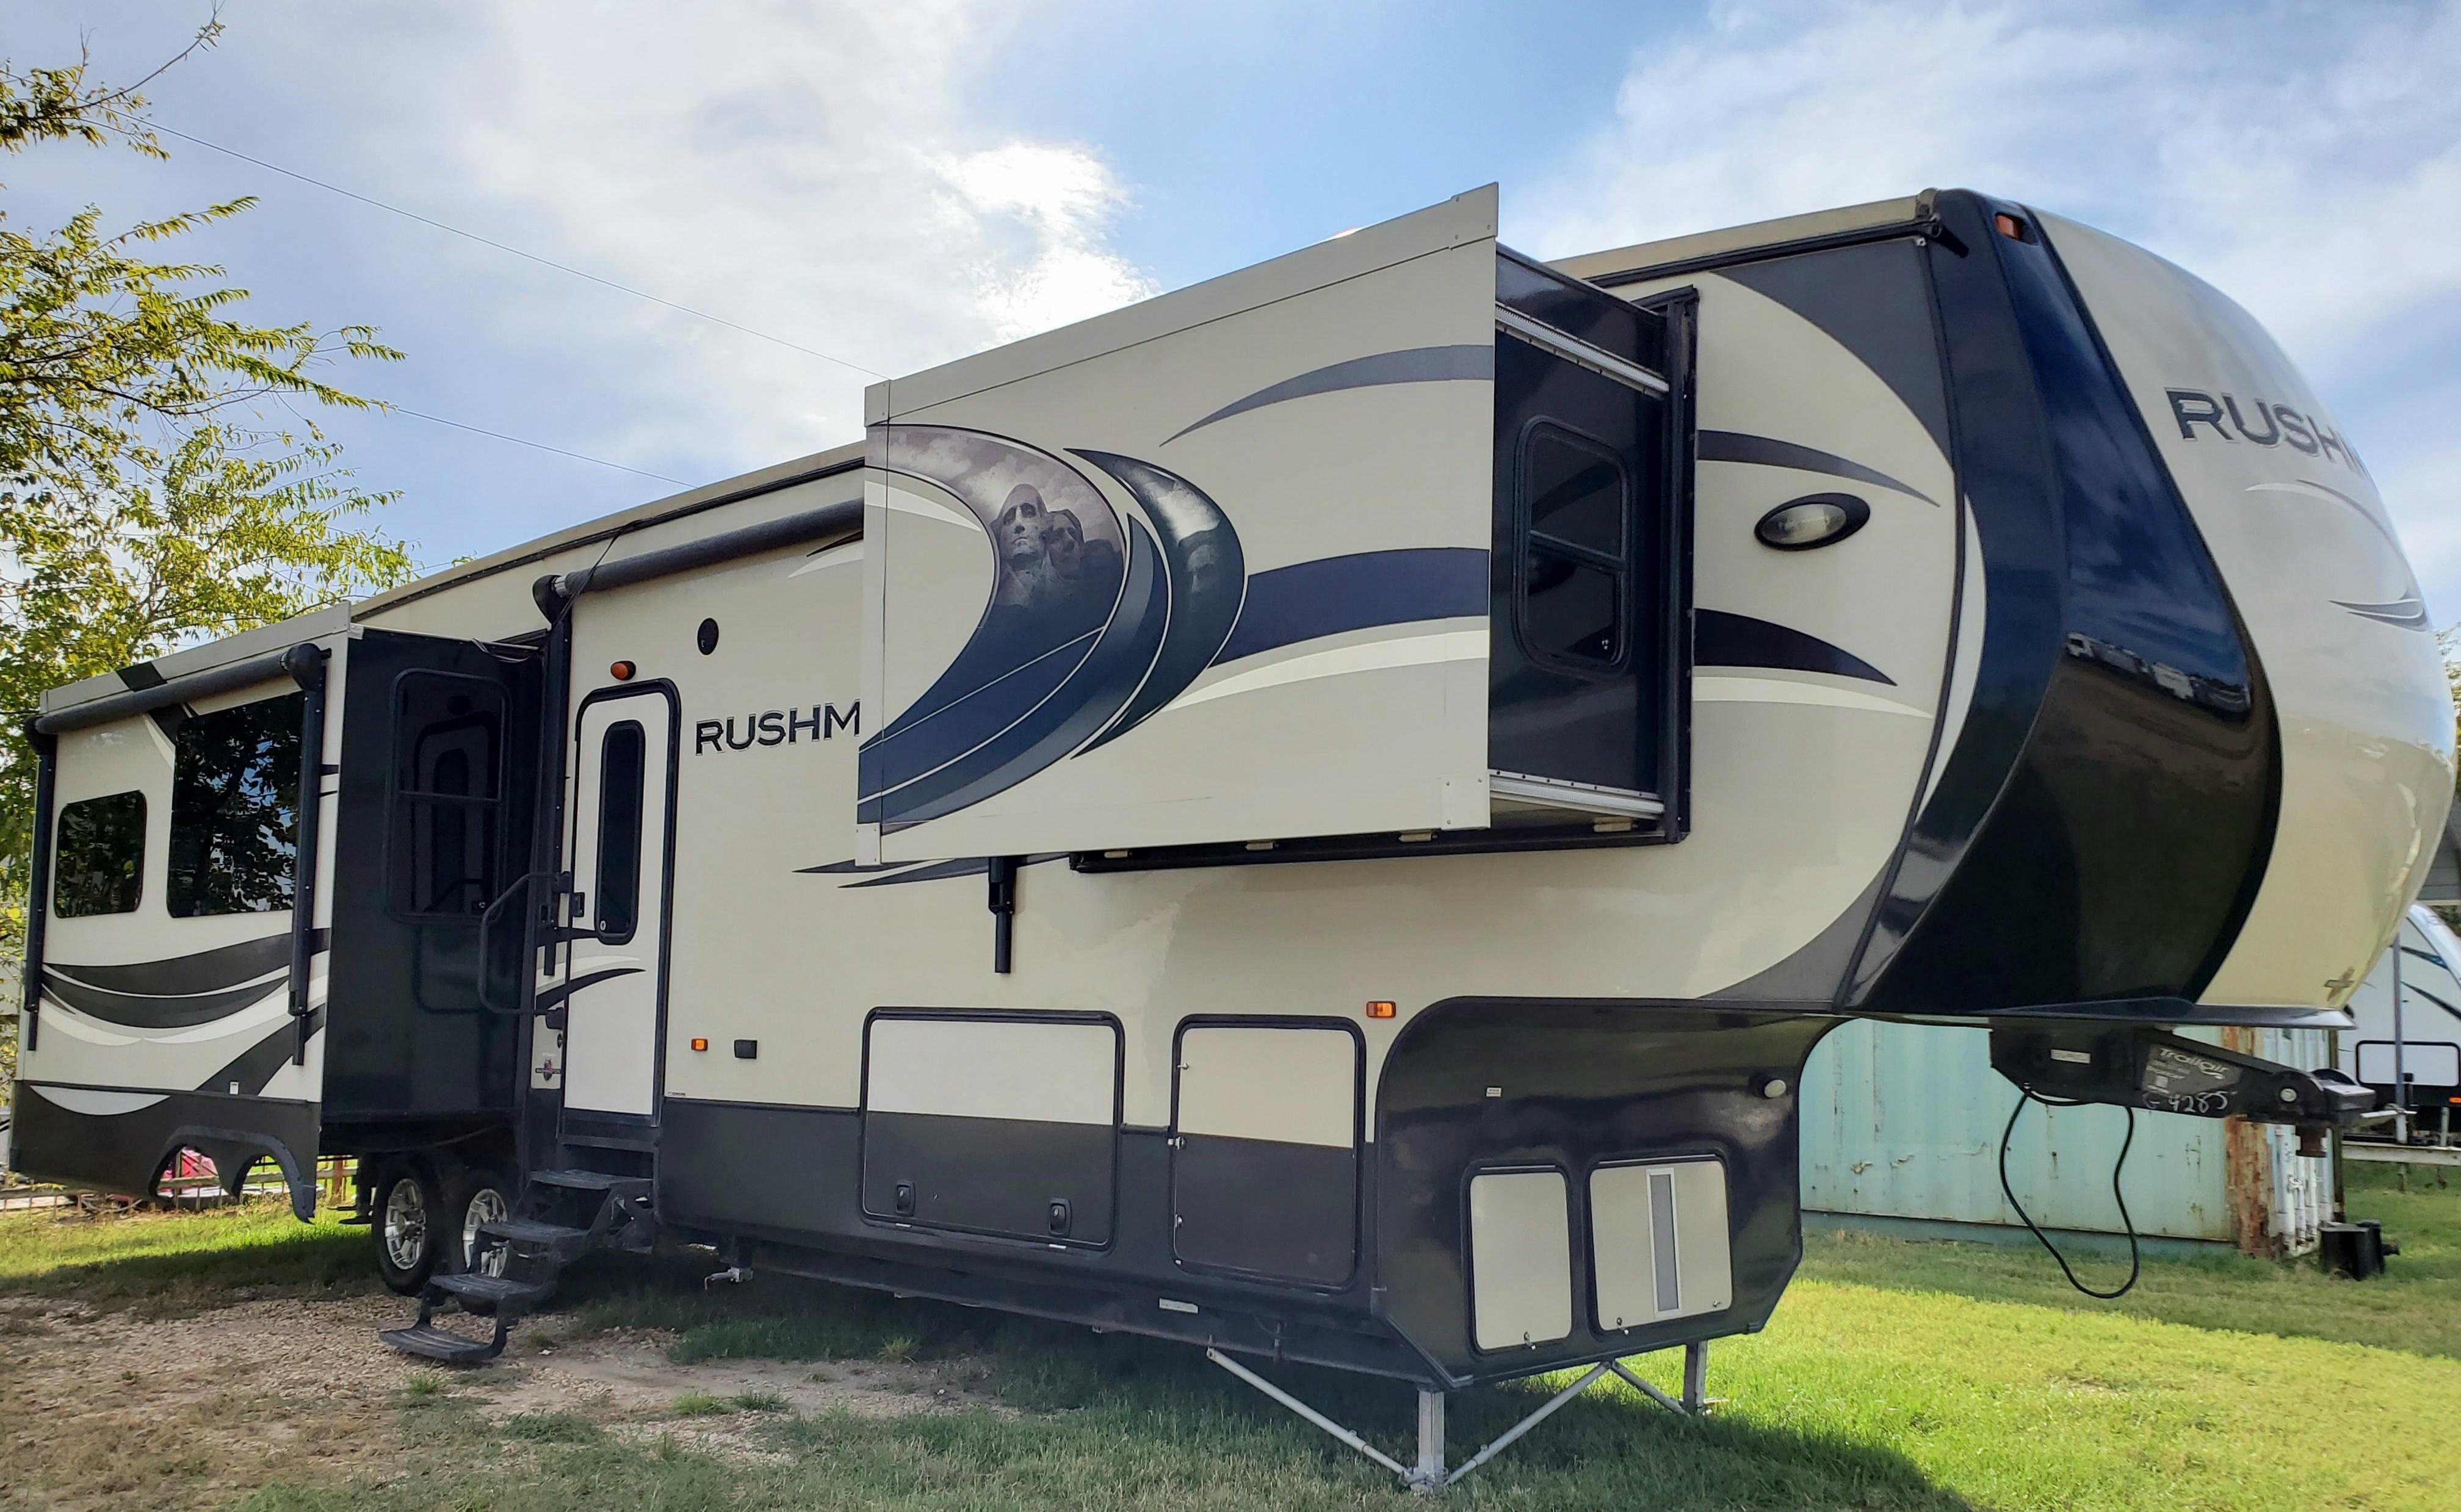 Used, 2014, CrossRoads, Rushmore Washington - RF39WA, Fifth Wheels